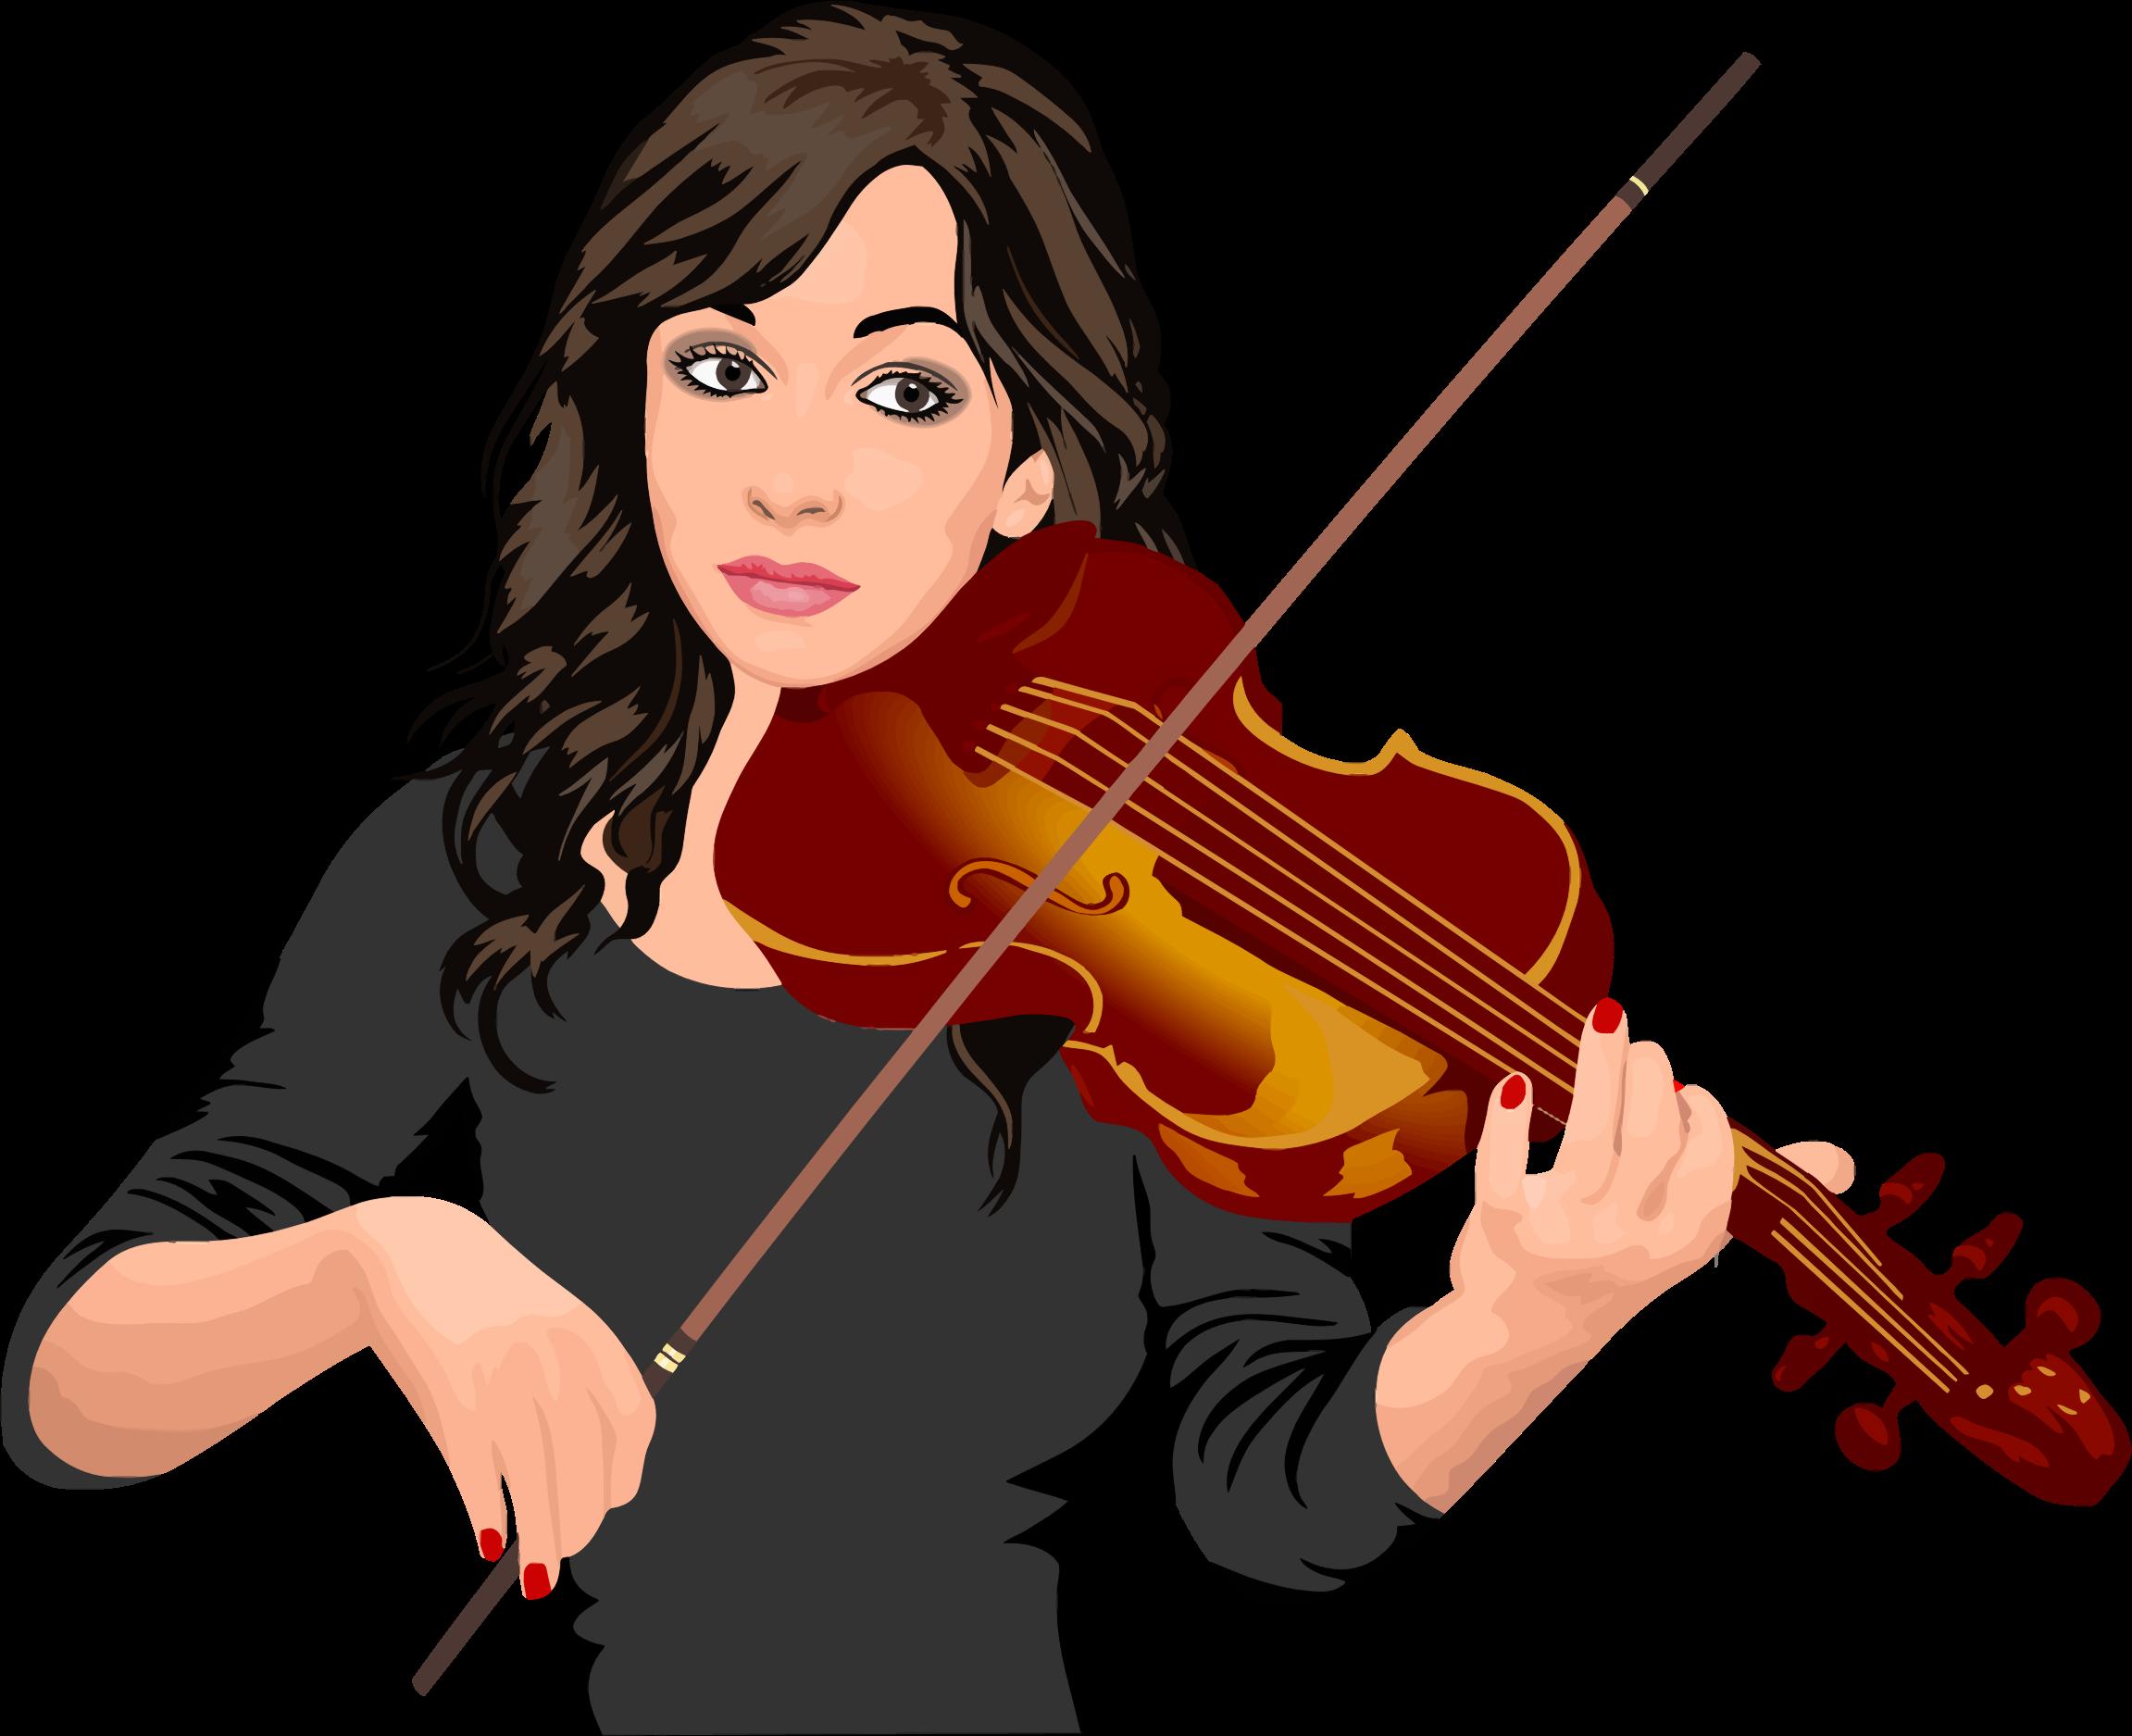 Картинки профессии музыканта